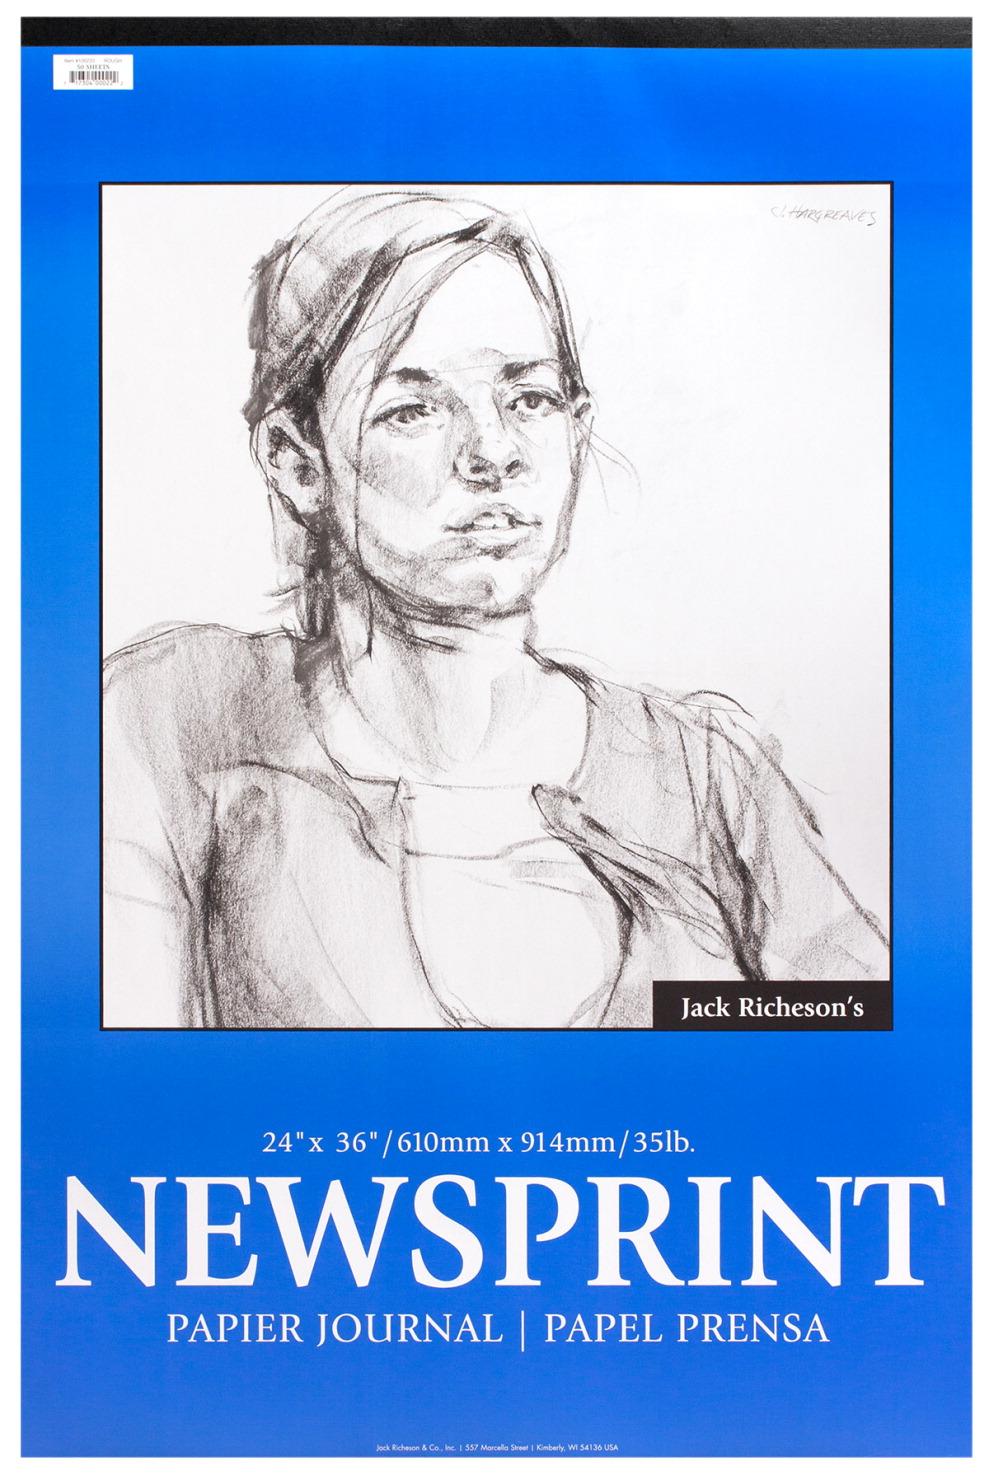 32 lb 50 Sheets Jack Richeson Newsprint Pad 24 x 36 Inches